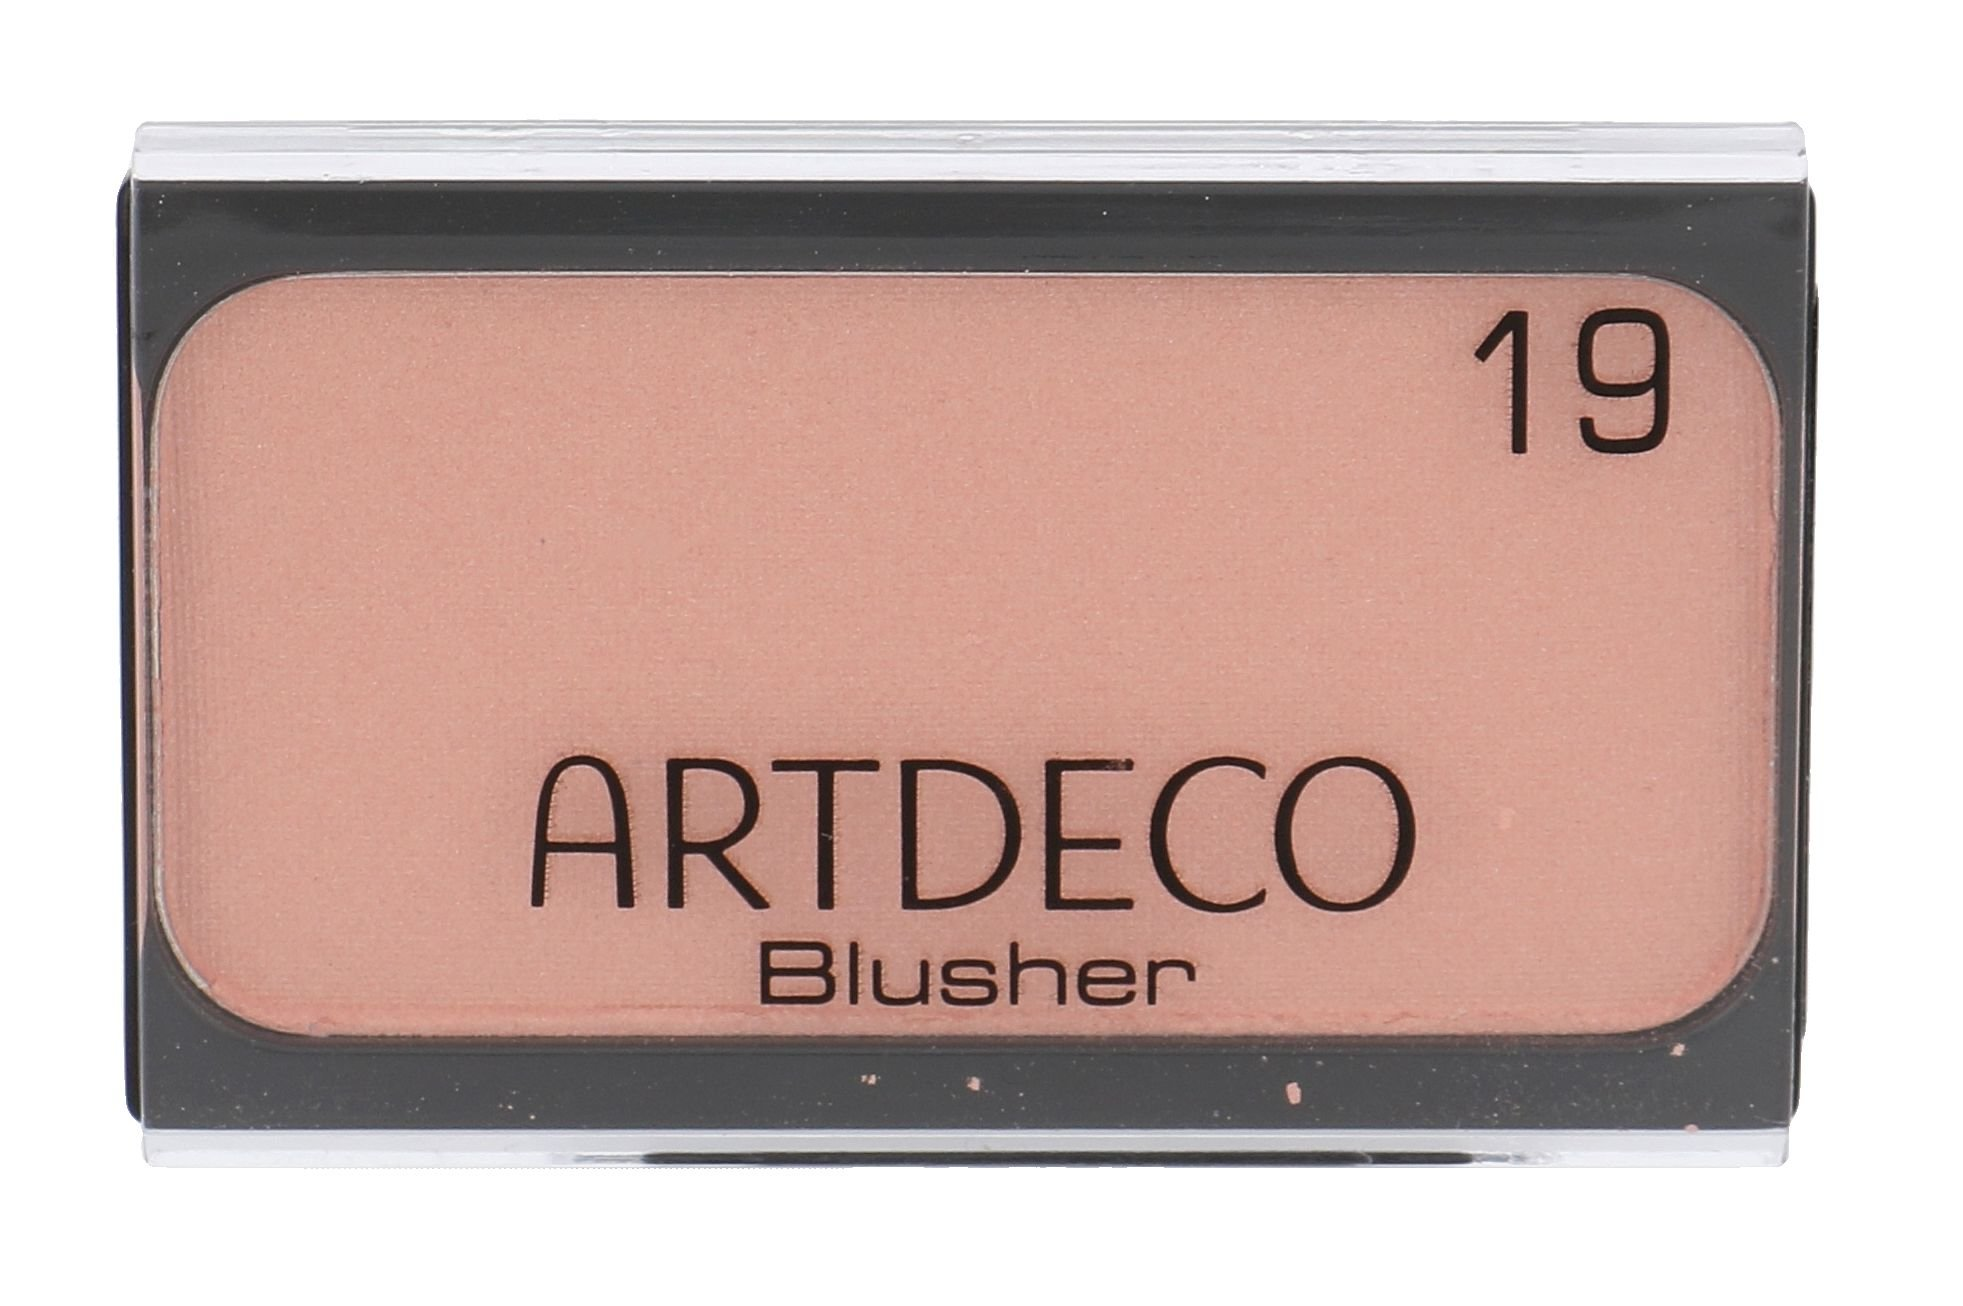 Artdeco Blusher Cosmetic 5ml 19 Rosy Caress Blush